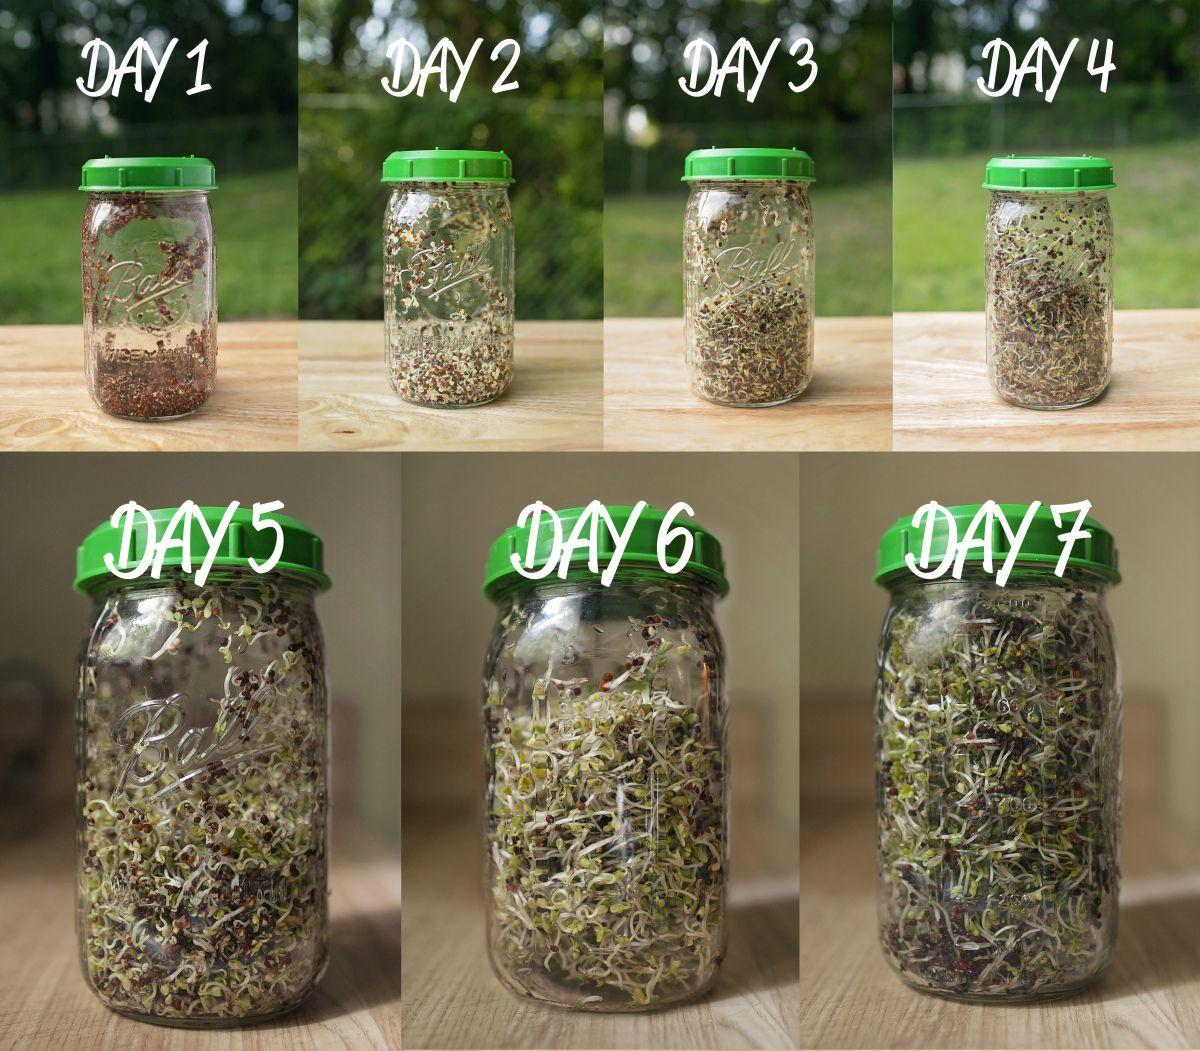 Grow Broccoli Sprouts! Broccoli sprouts, Broccoli